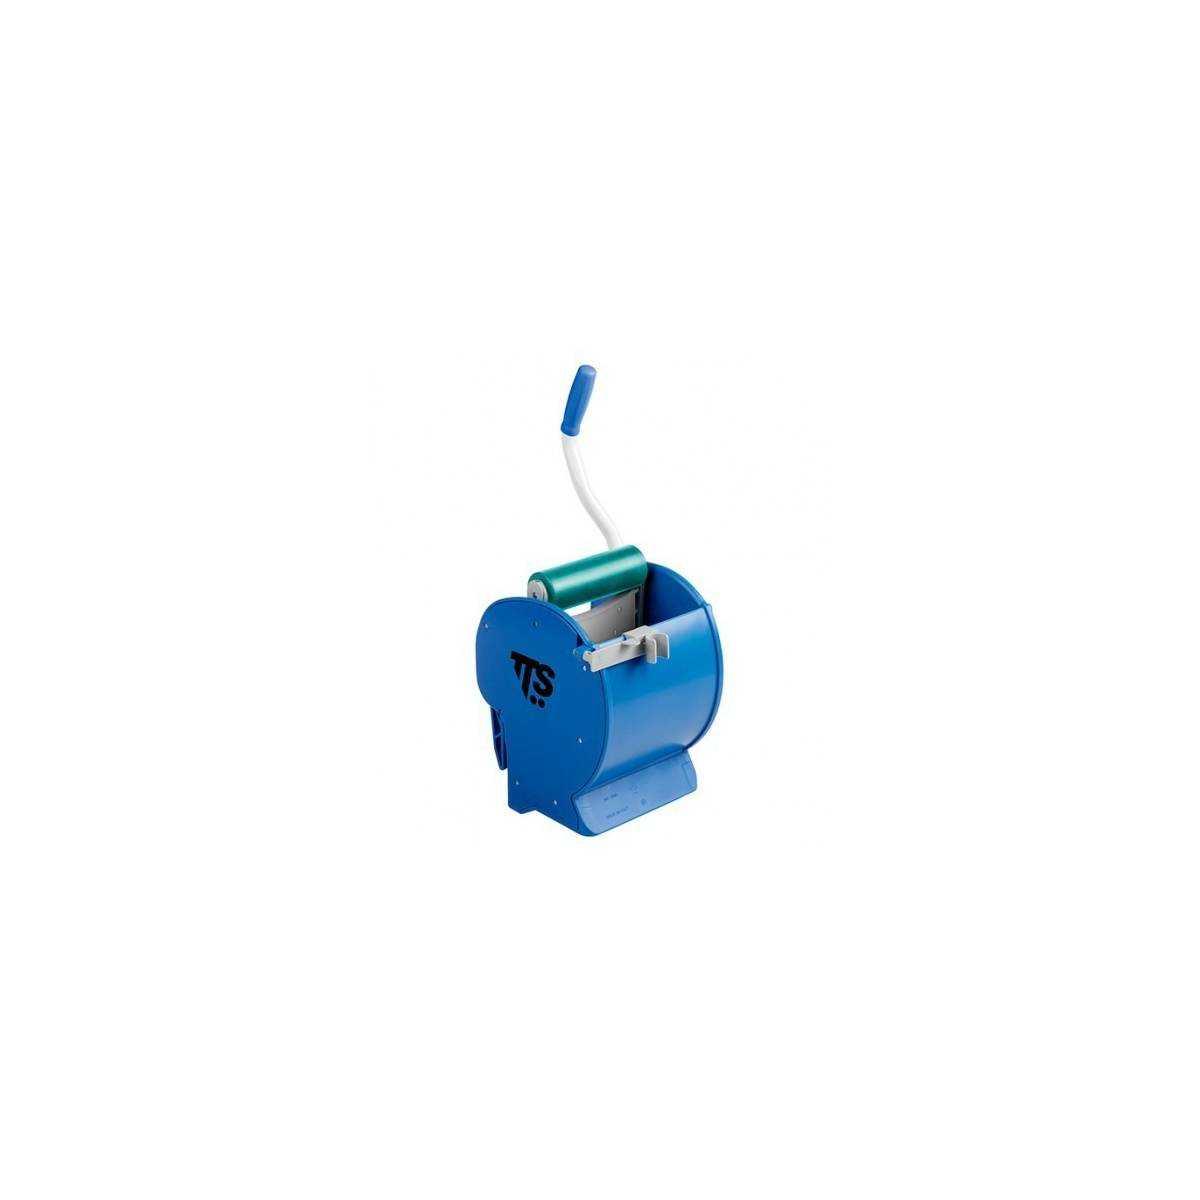 Отжим Dry (Синего цвета) 3413 TTS